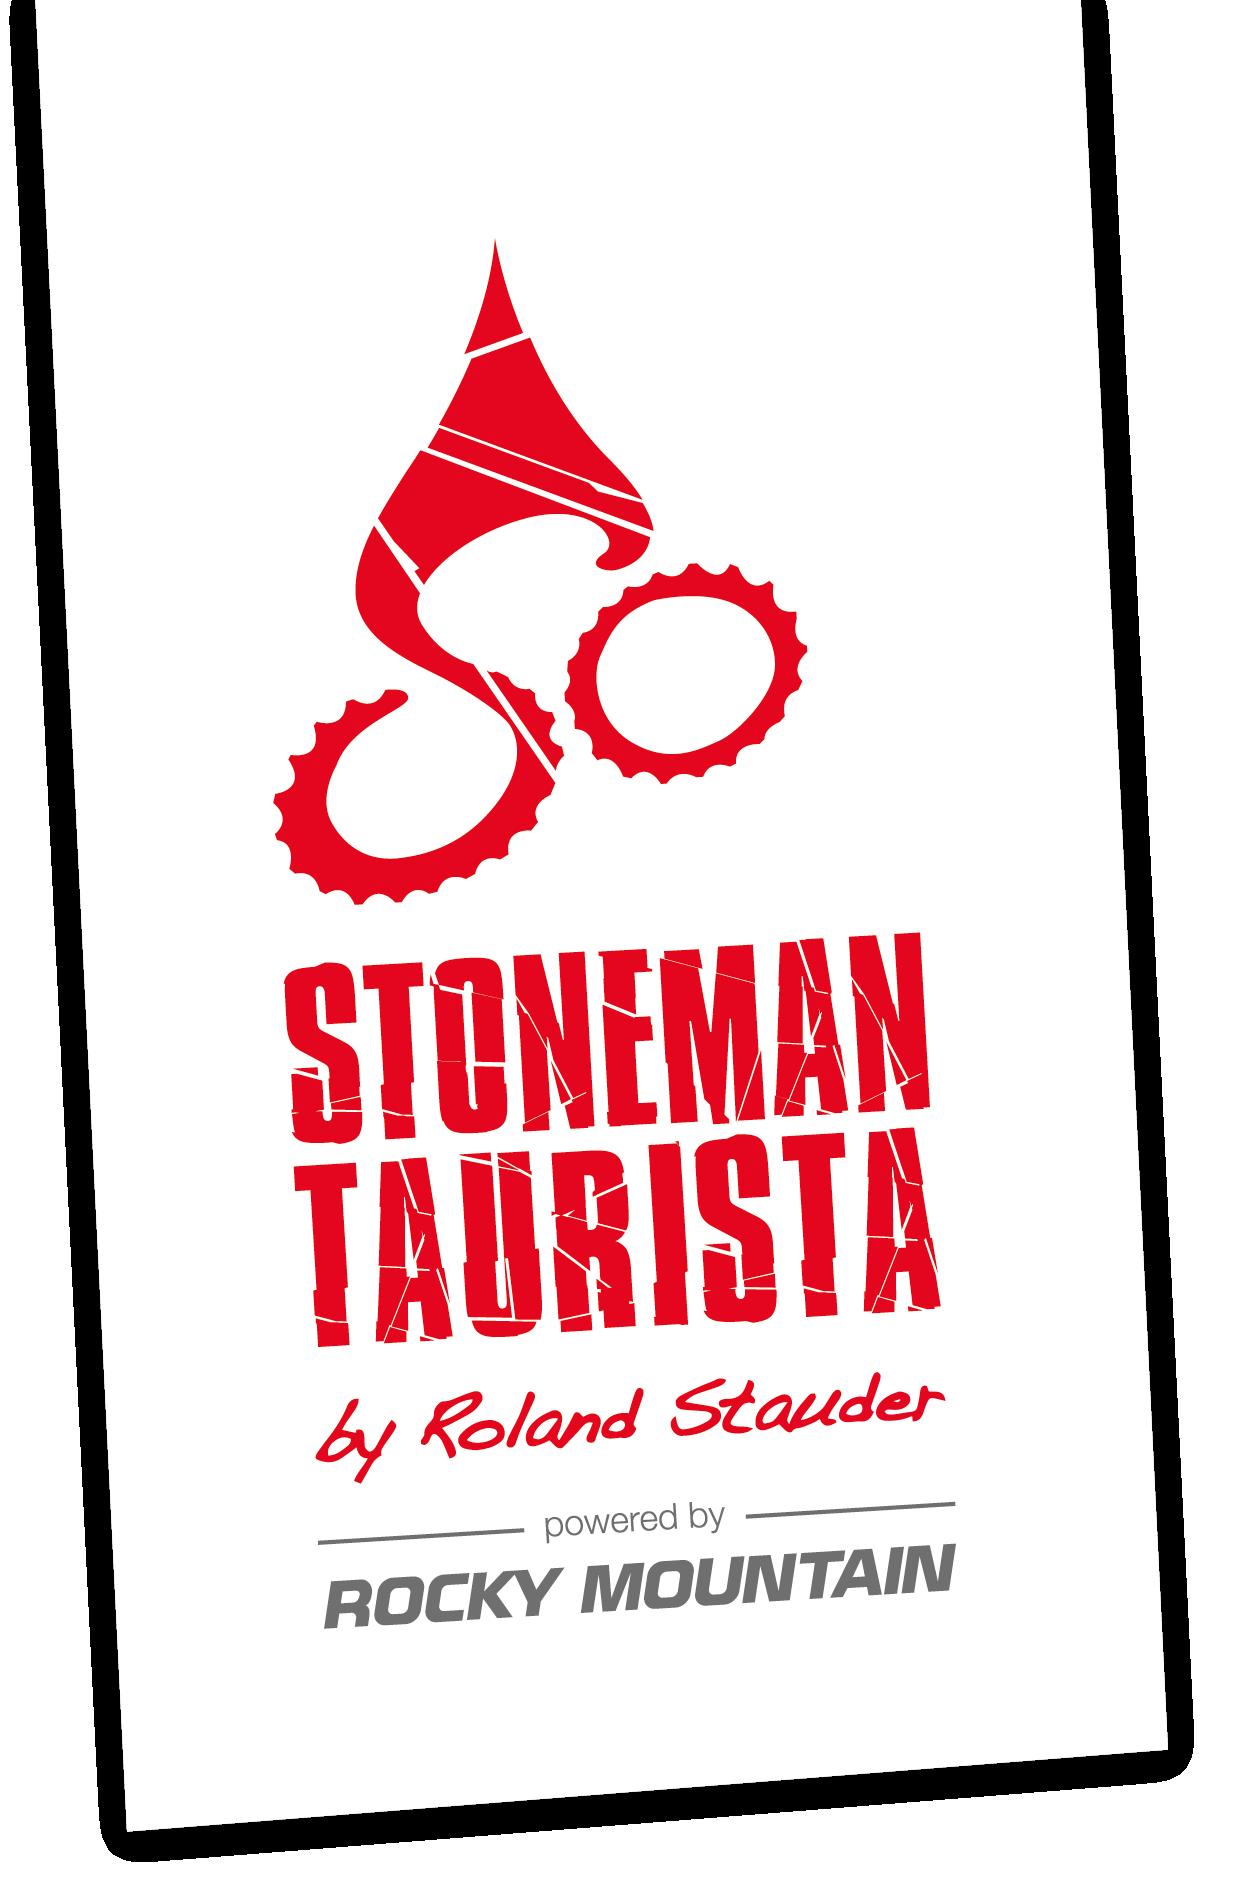 Stoneman Taurista in Flachau